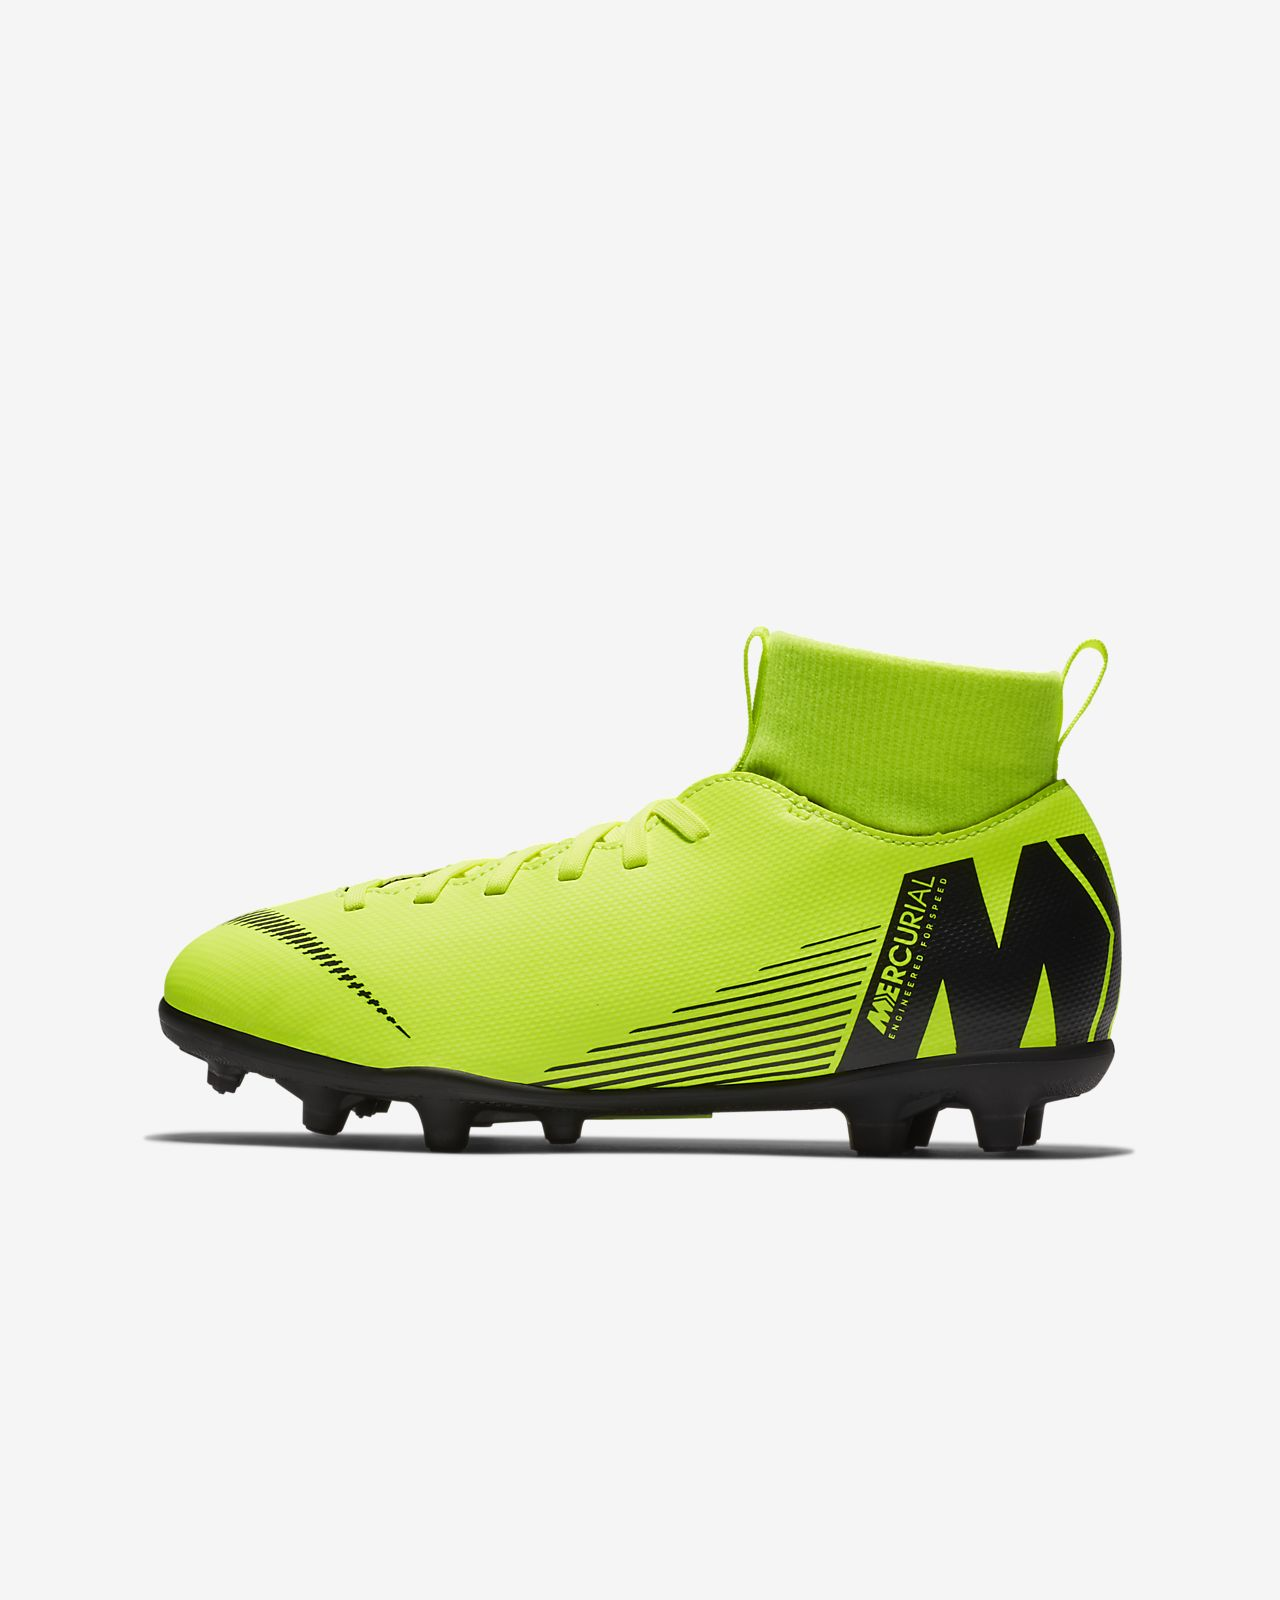 002834d3e5 ... Chaussure de football multi-terrains à crampons Nike Jr. Mercurial  Superfly VI Club pour